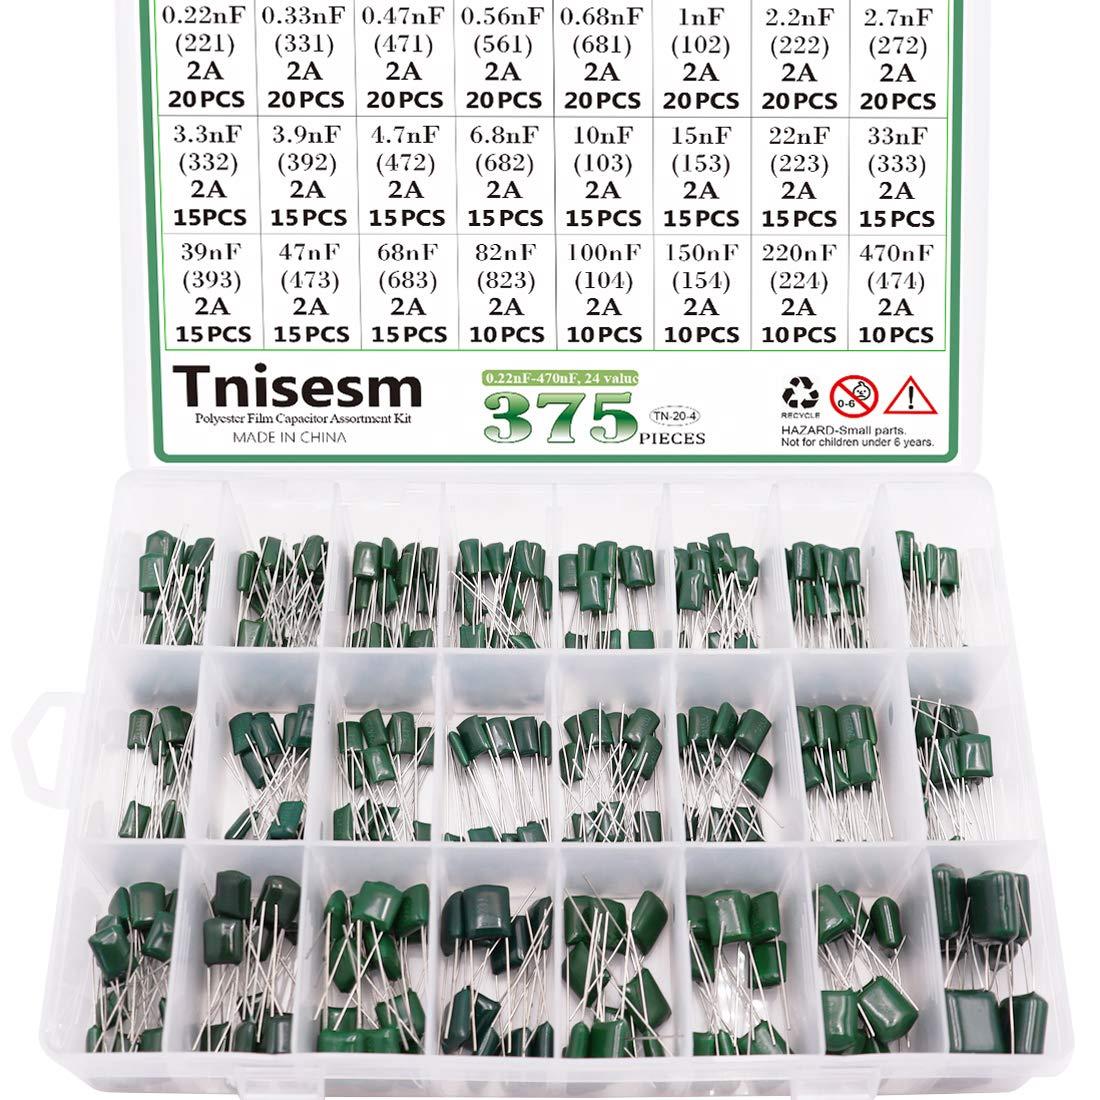 Tnisesm 375 Pcs 24 Value Metalized Mylar Polyester Film Capacito